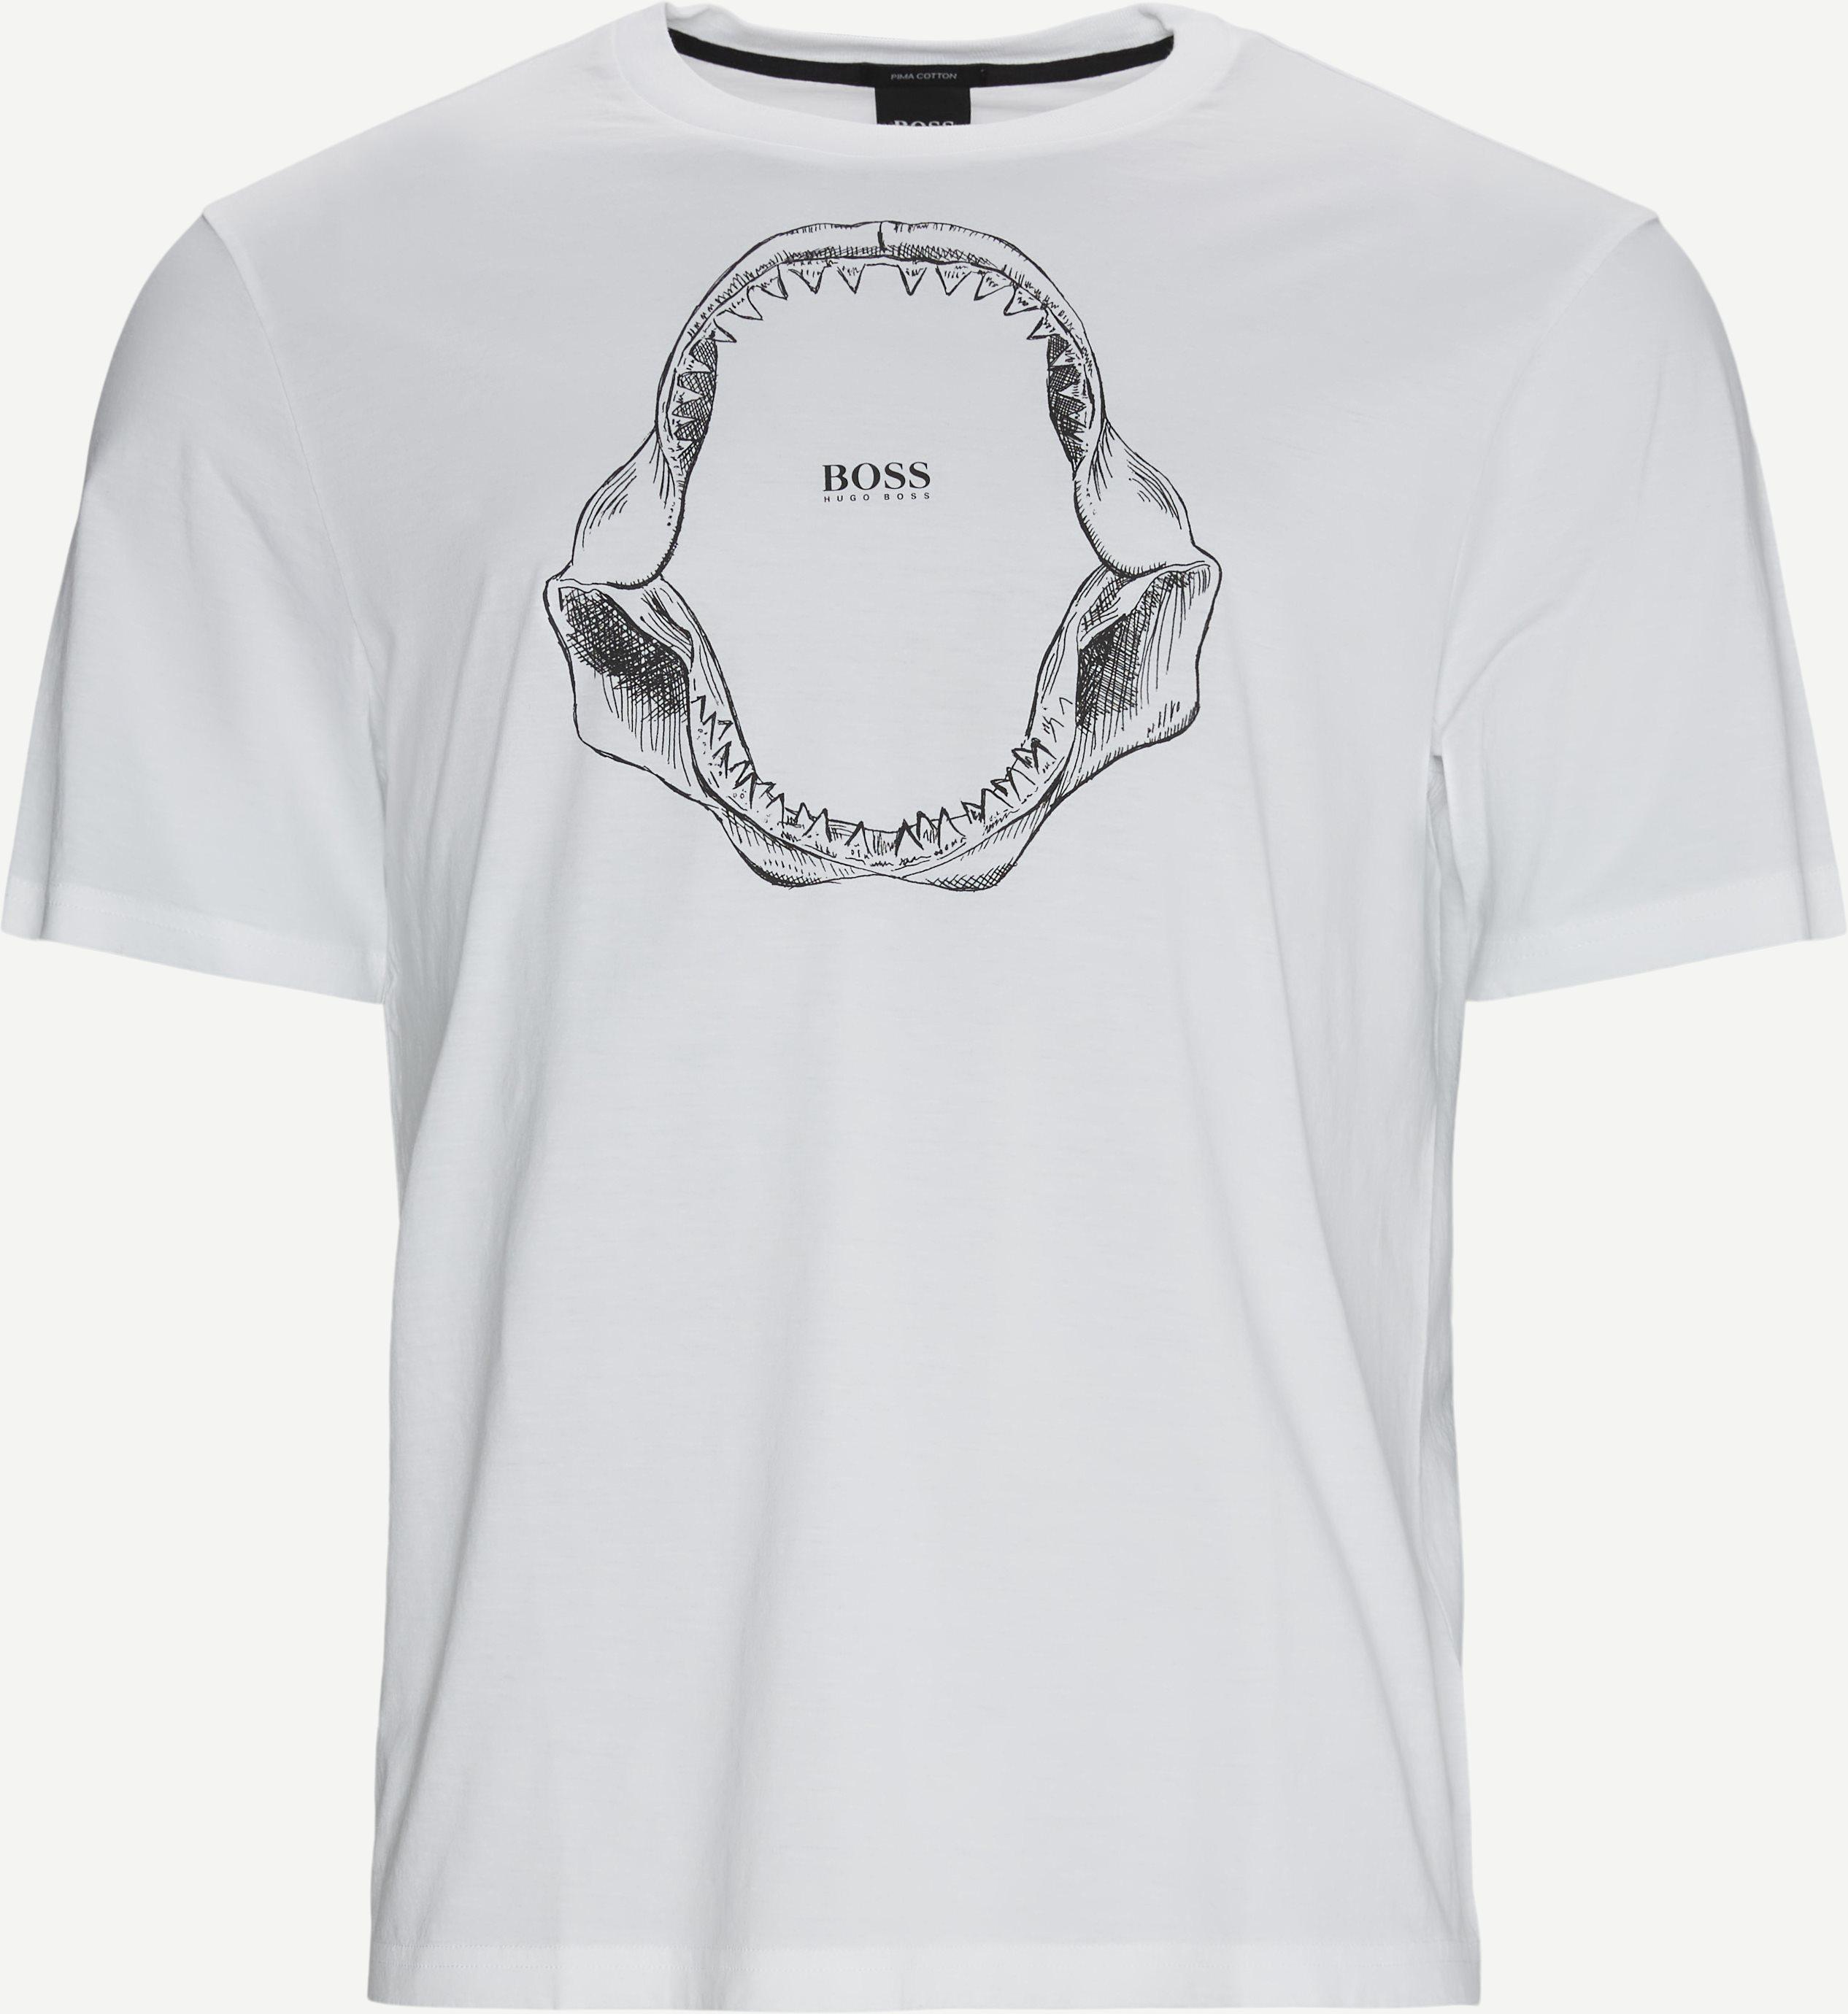 Tima 2 T-shirt - T-shirts - Regular - Vit